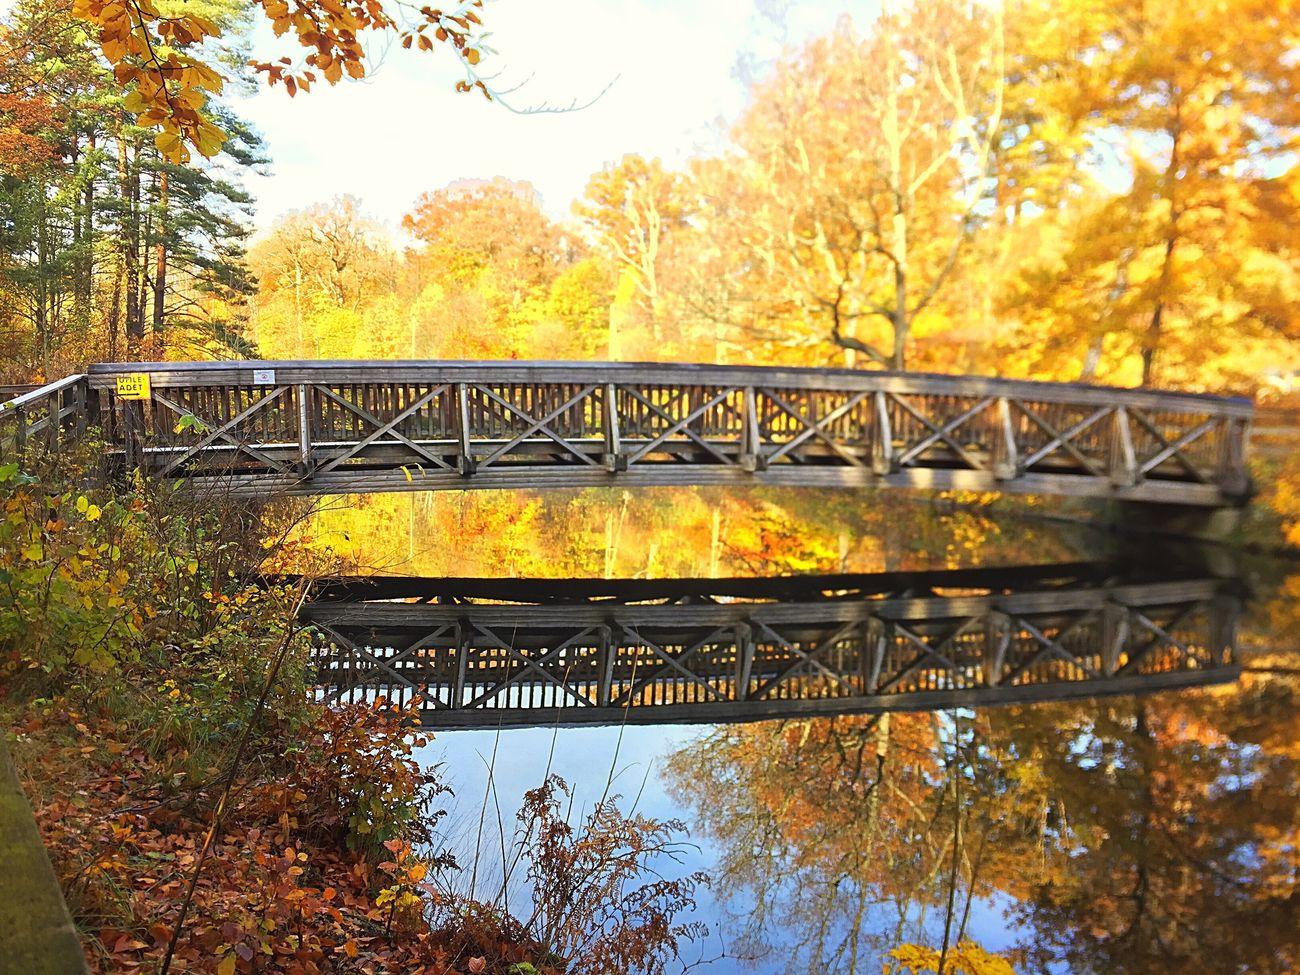 Tree Autumn Yellow Outdoors Nature Water Railway Bridge Beauty In Nature Architecture Beautiful Light EyeEm Nature Lover